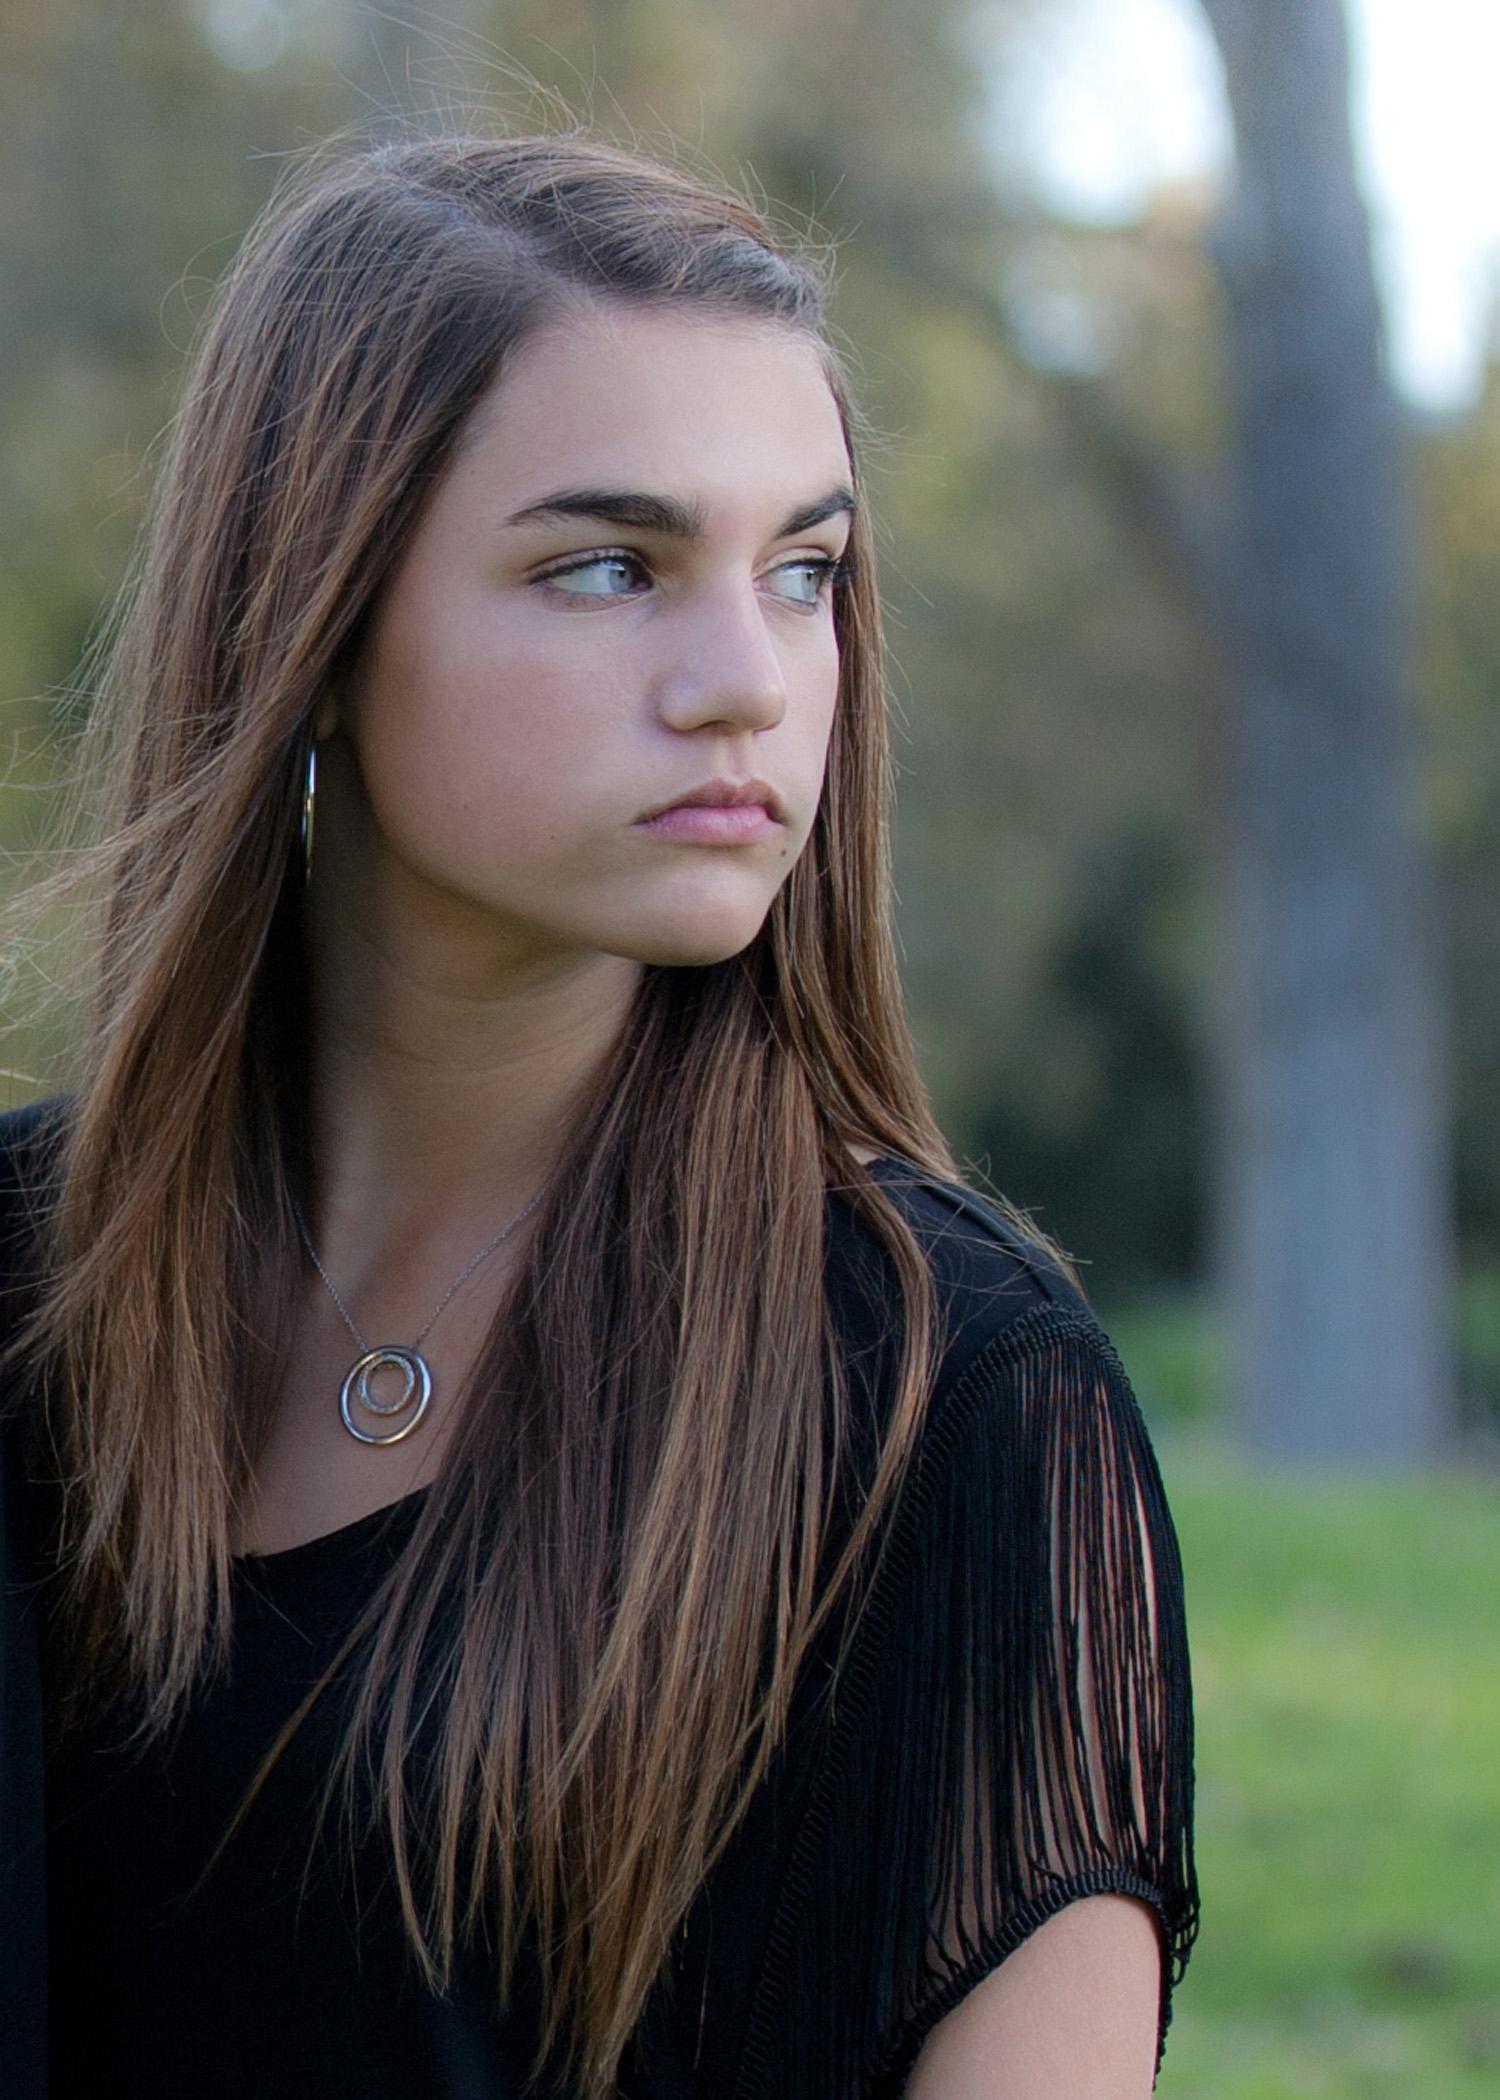 teenage girl long brown hair park setting